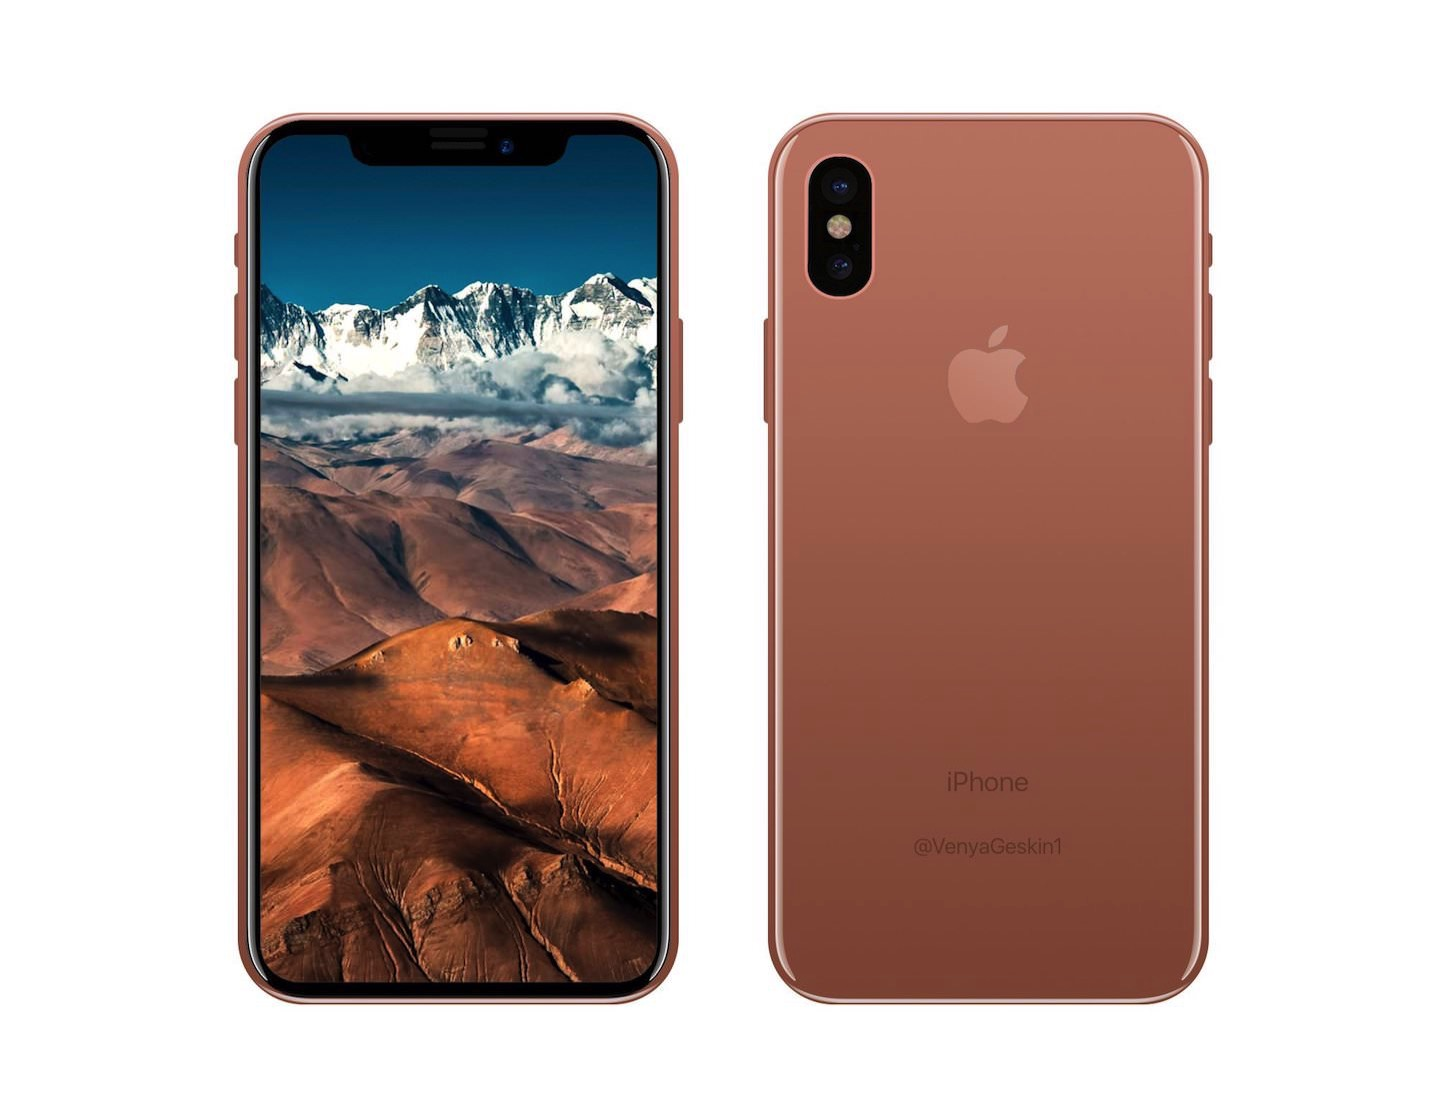 copper-gold-iphone-8-pro.jpg